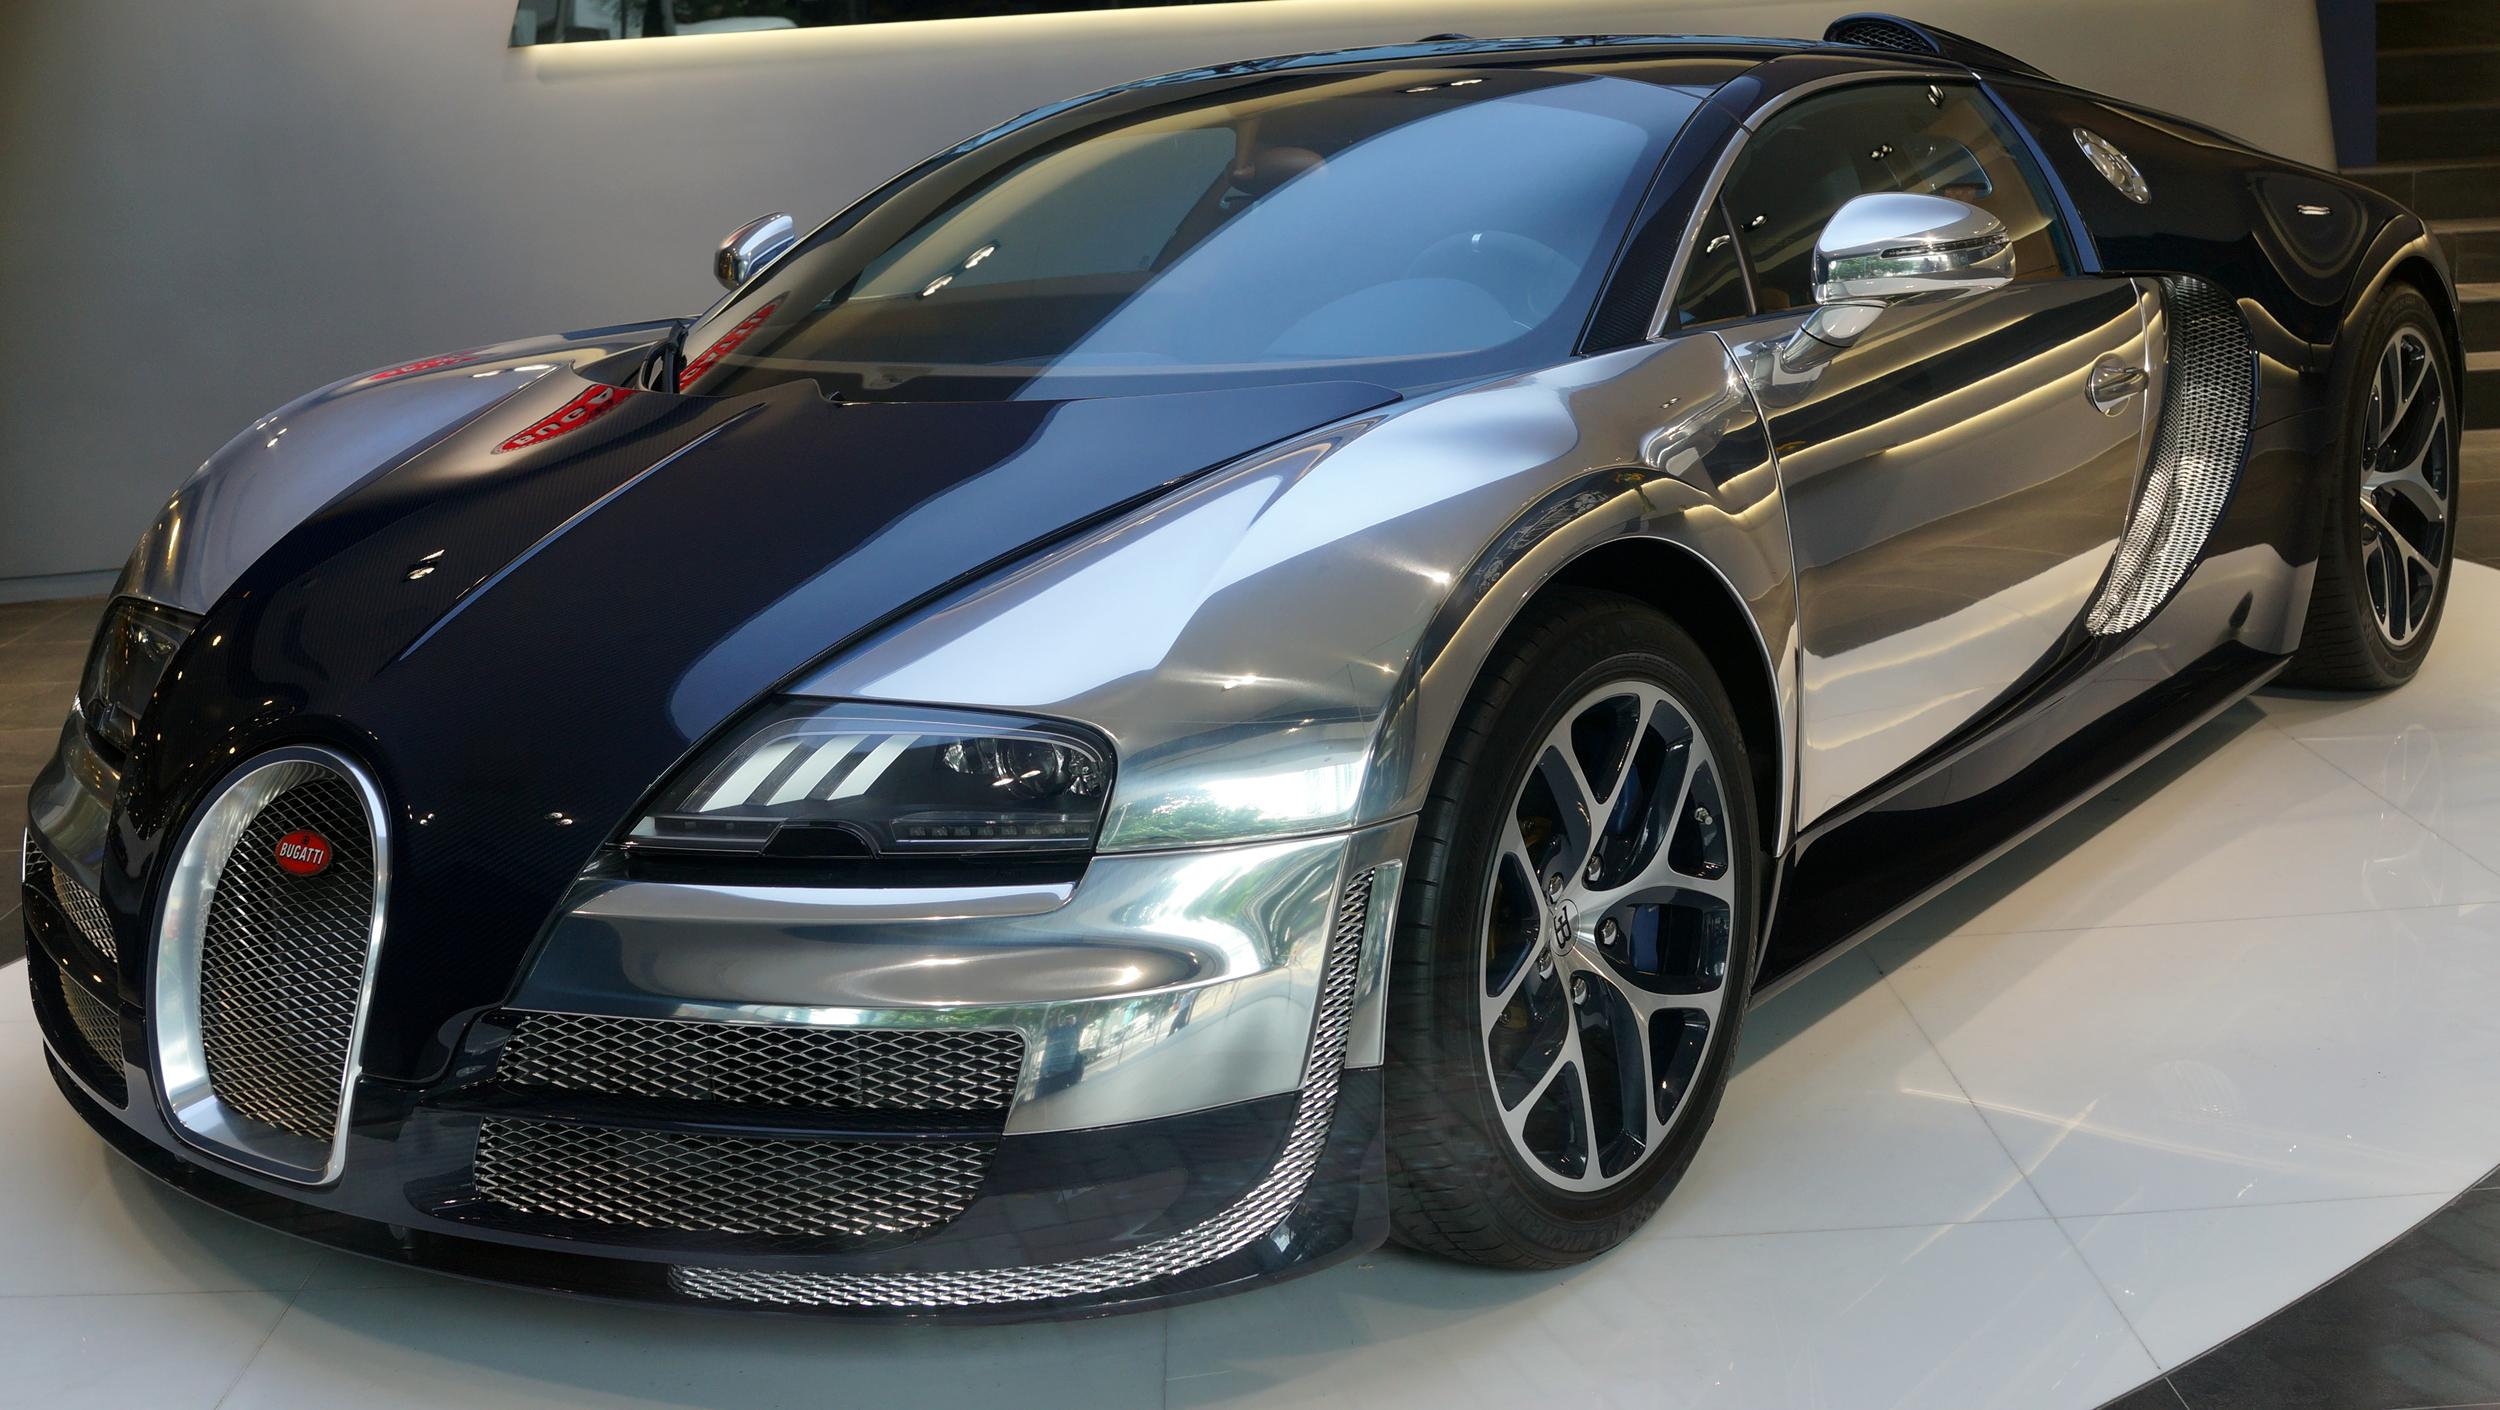 A better image of the Bugatti Veyron